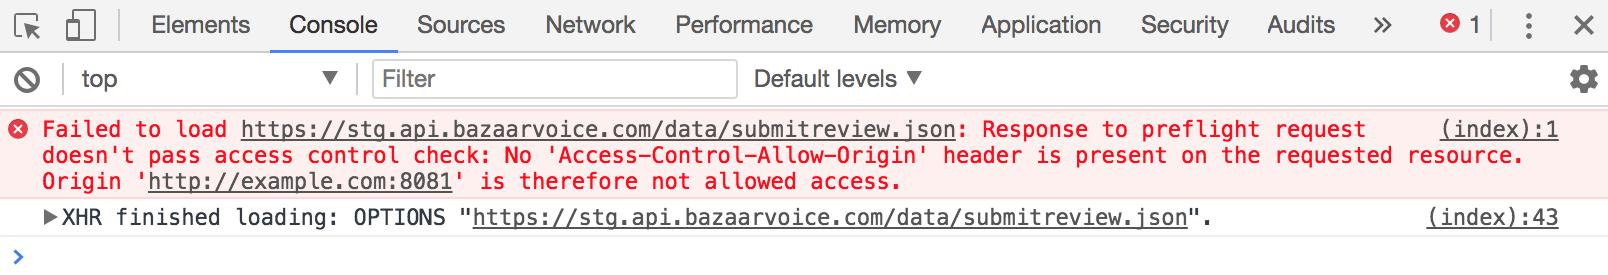 Bazaarvoice Developer Portal | CORS